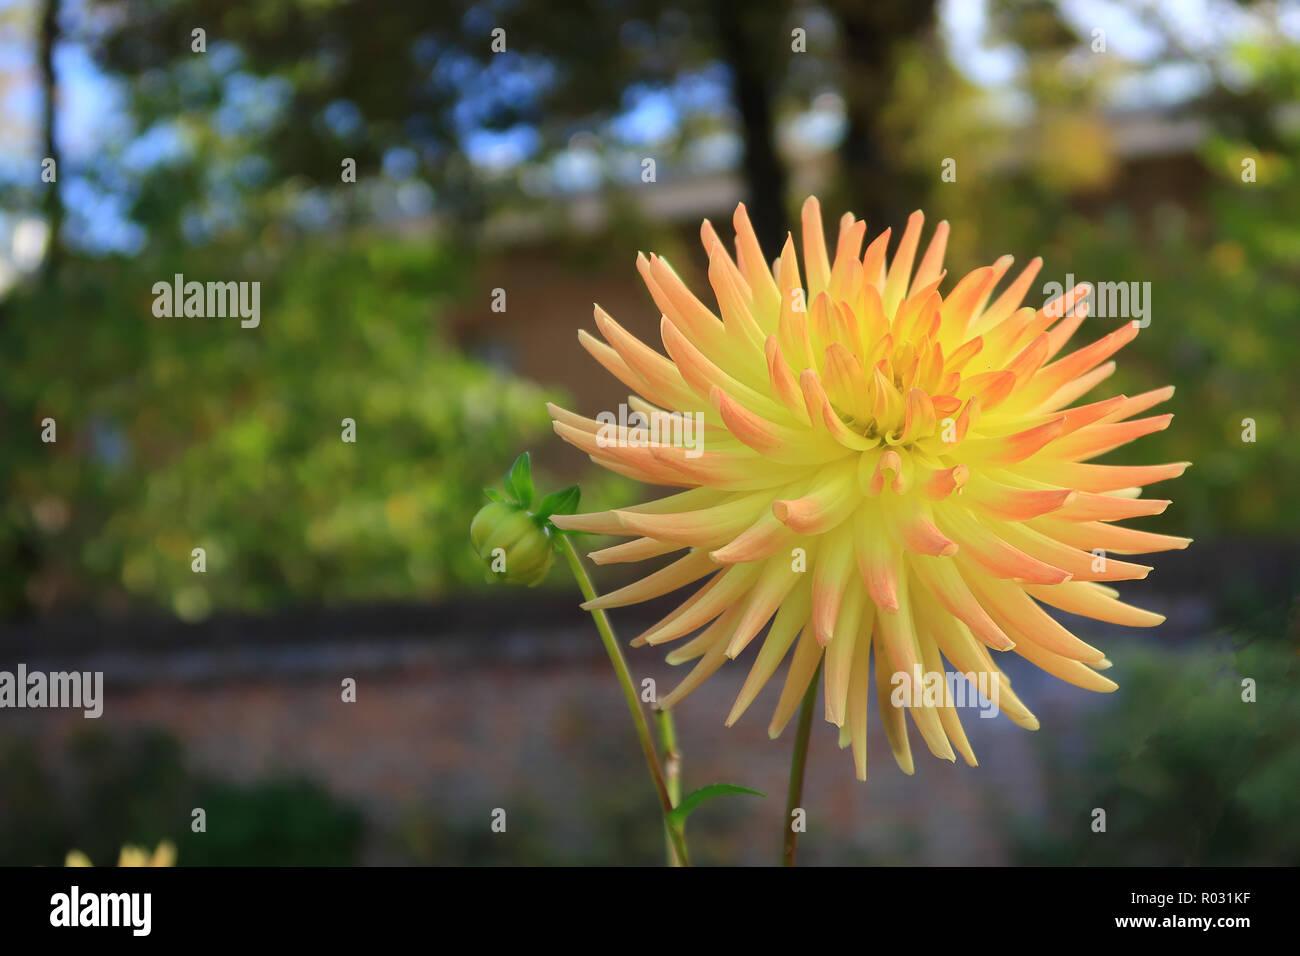 Yellow petals of the semi cactus Dahlia - Stock Image